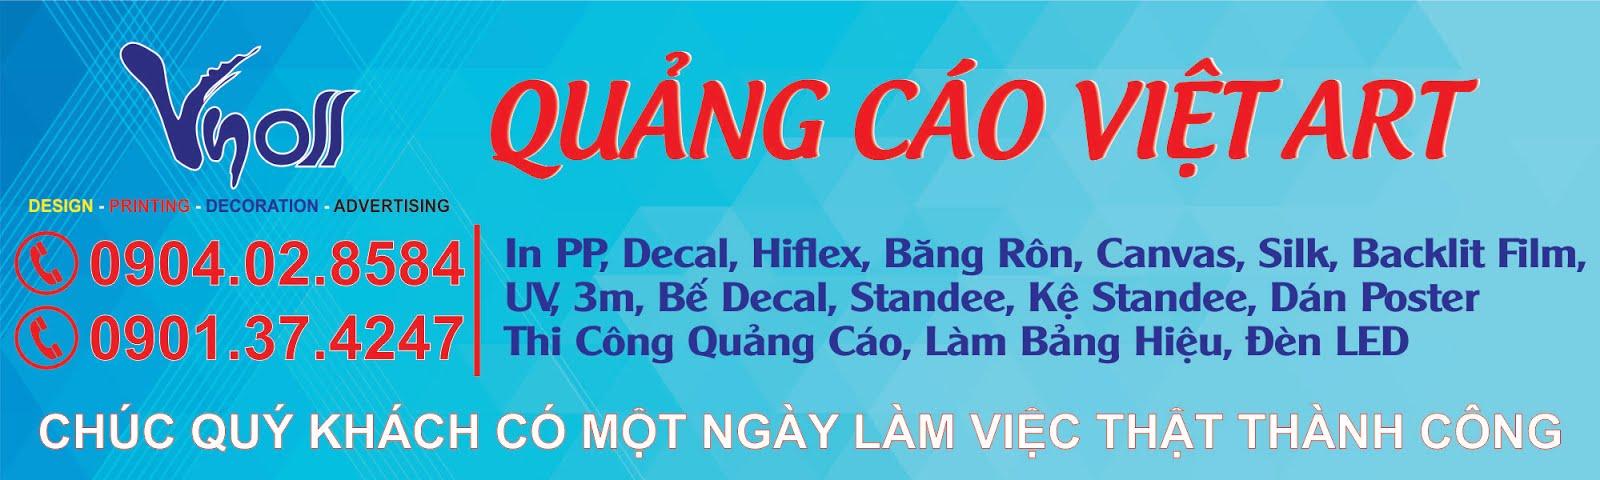 In PP, In Decal, In Hiflex, Standee, Thi Công Quảng Cáo Giá Rẻ